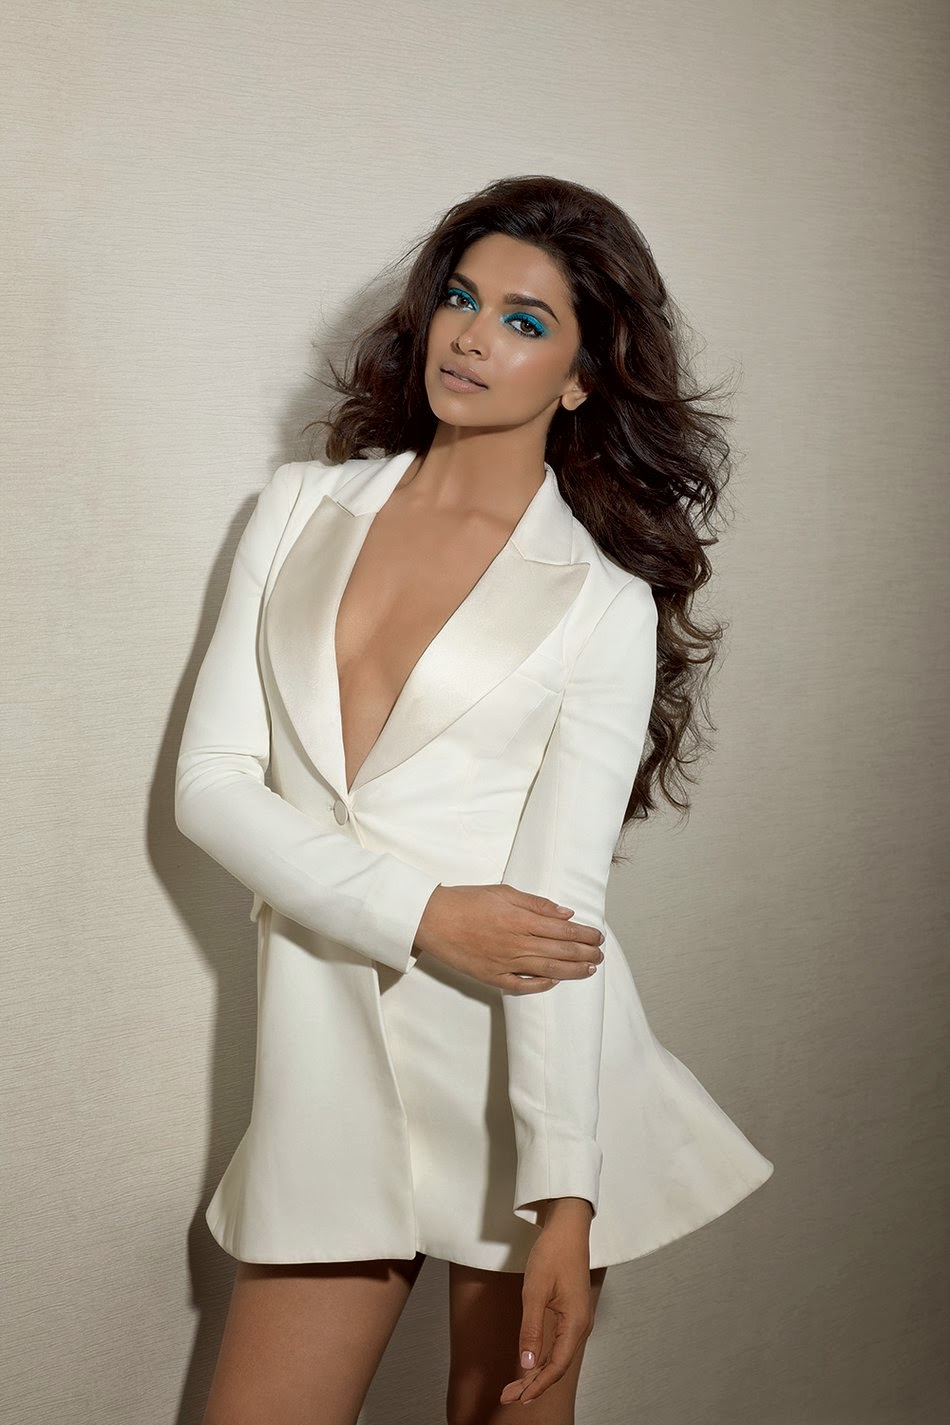 TamilCineStuff | : Deepika Padukone Sizzling Hot and Sexy ...